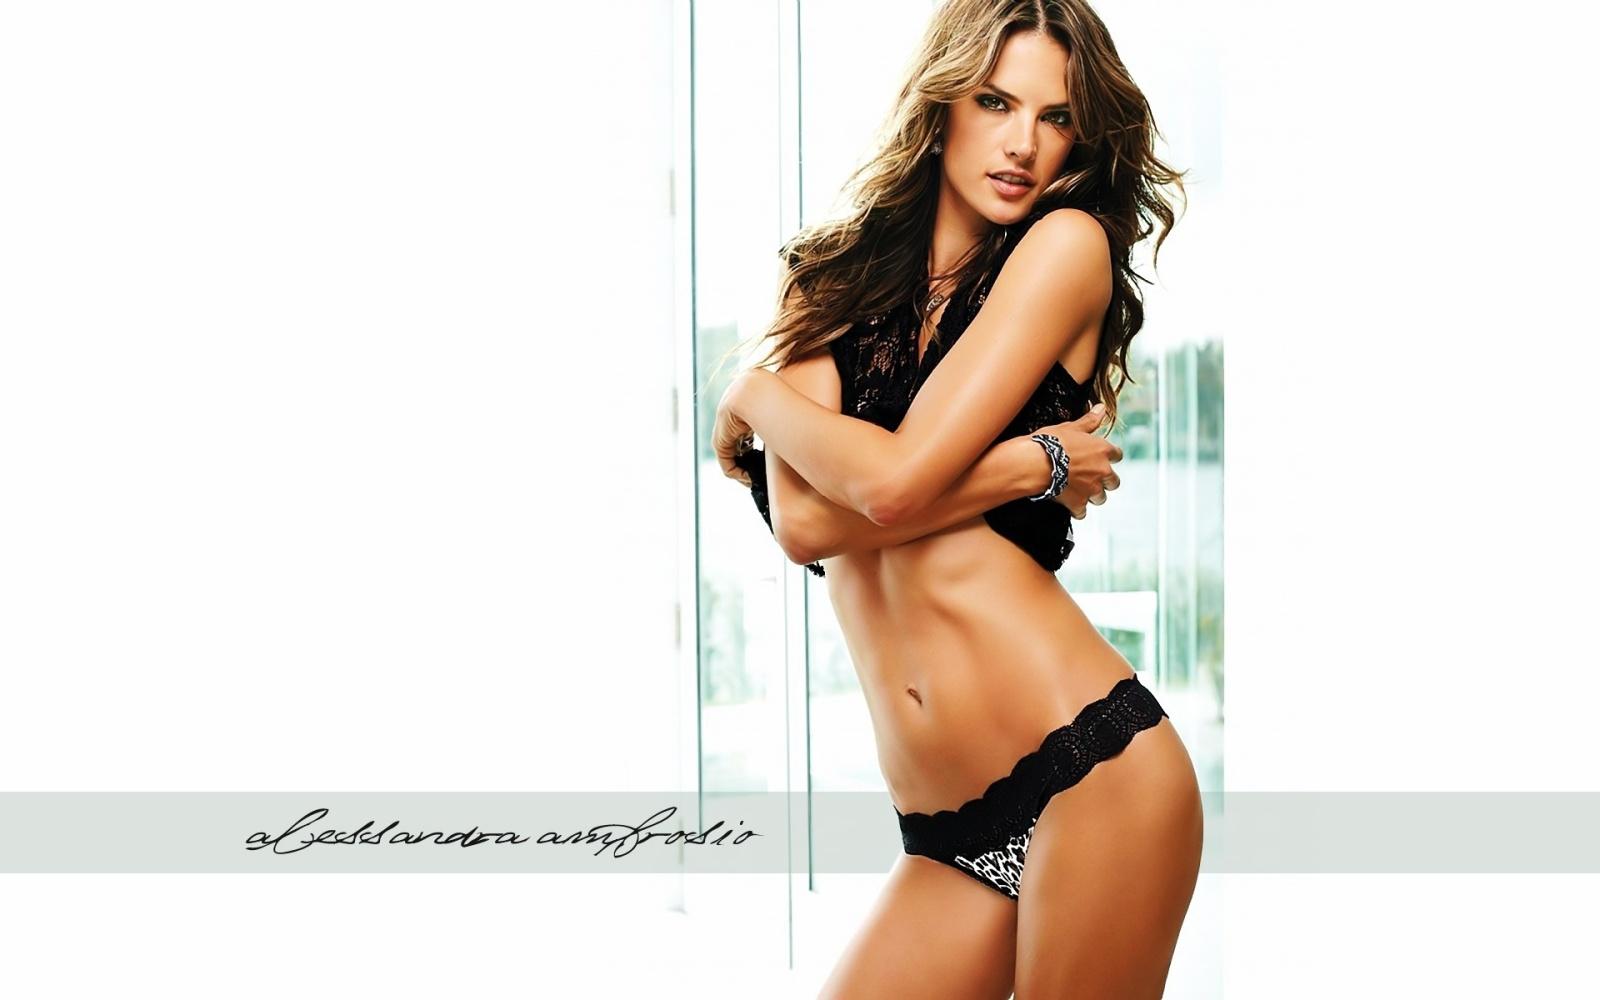 http://4.bp.blogspot.com/_AjWUpQhTvyg/S-4V2lXJ3JI/AAAAAAAAB4U/nwwRAPpeCSY/s1600/Alessandra+Ambrosio4.jpg